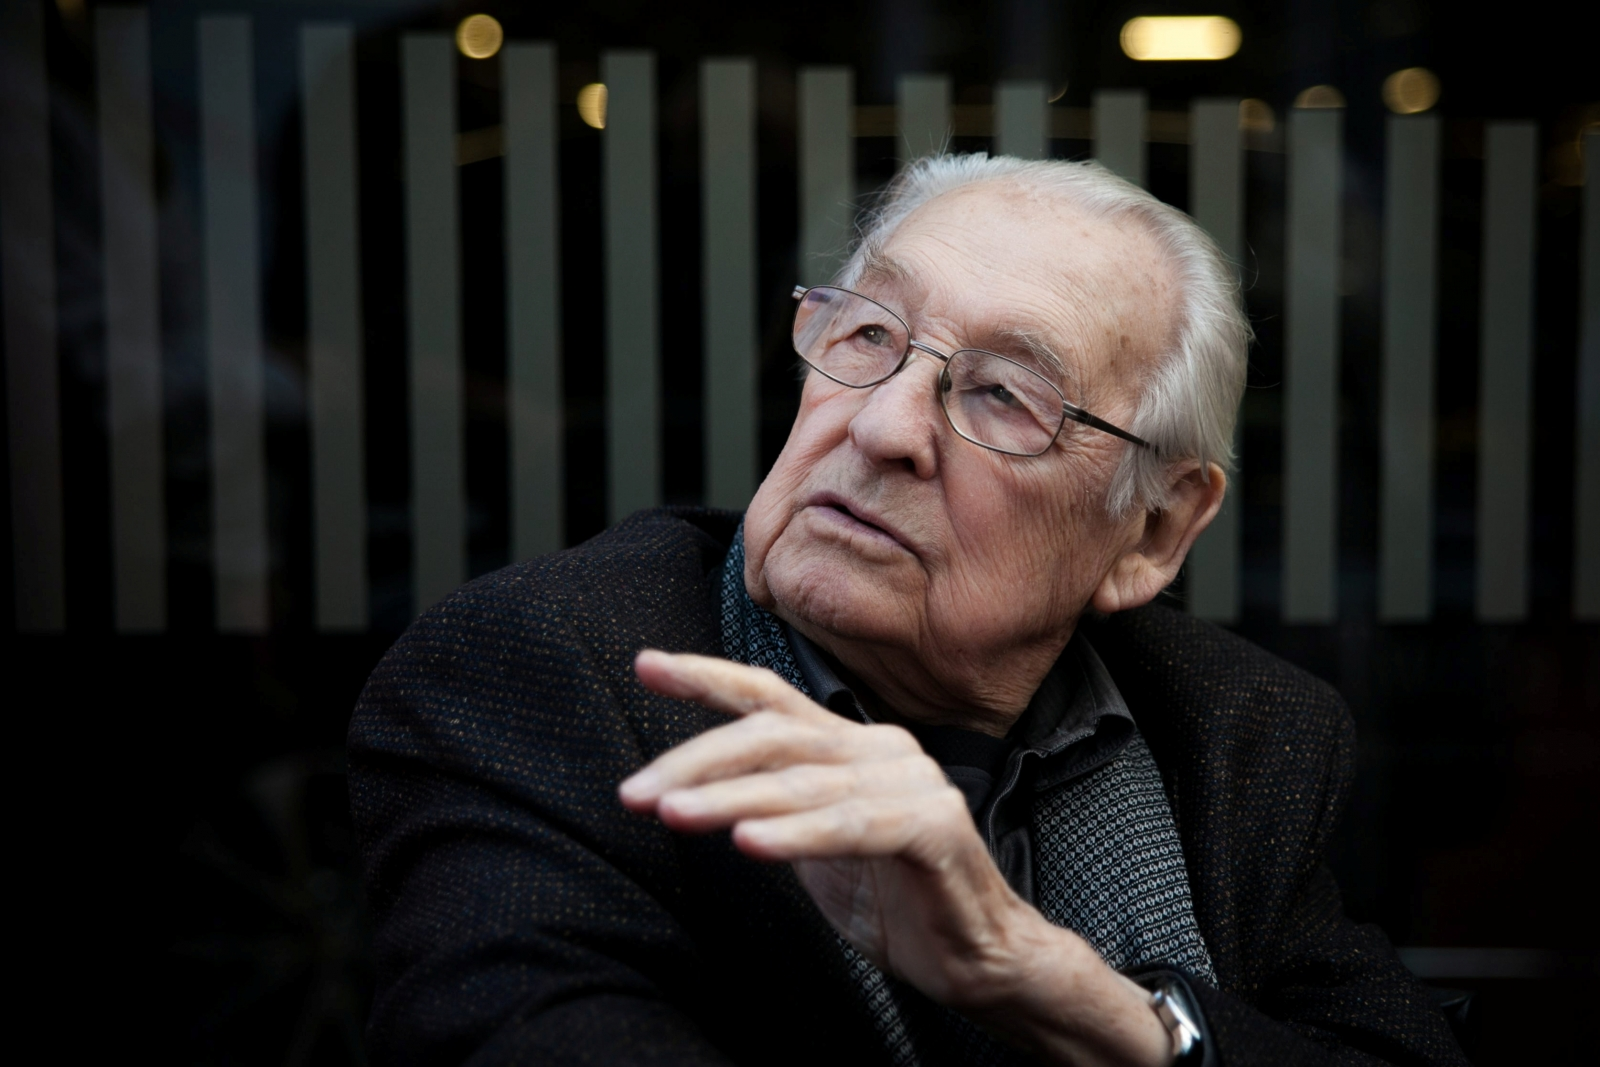 Oscar-winning Polish film director Andrzej Wajda